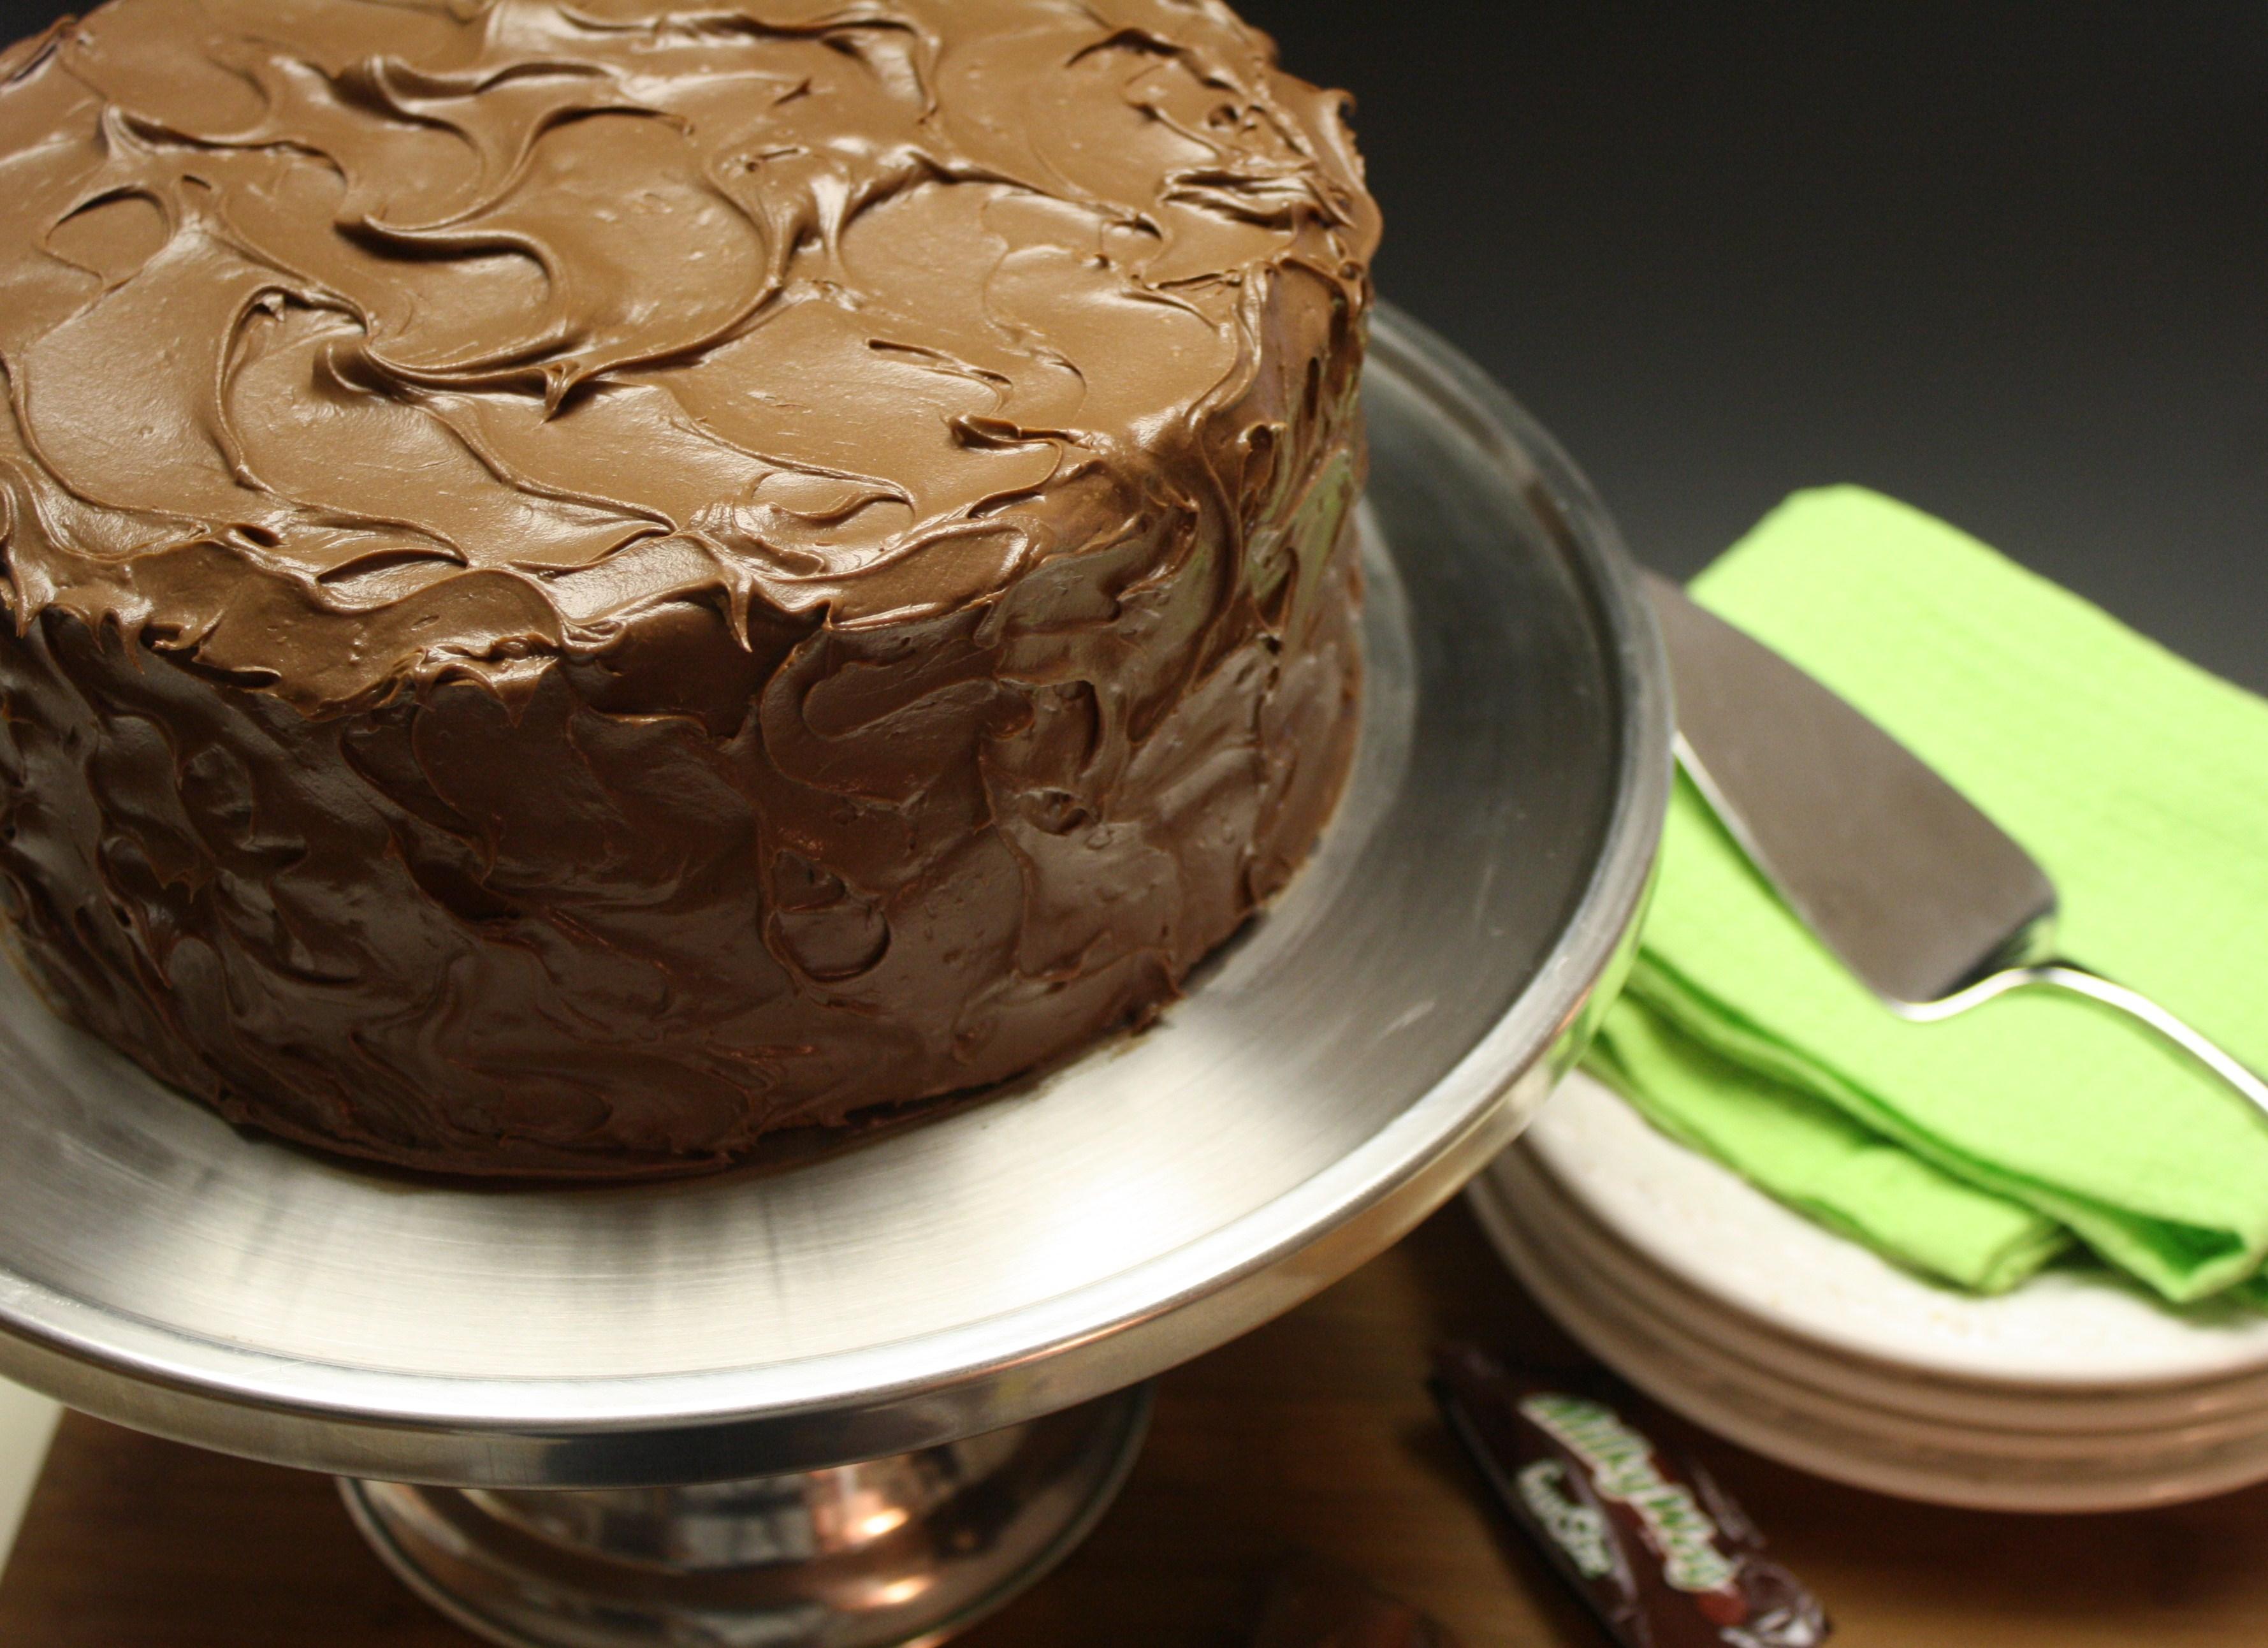 milky way cake recipe - HD3558×2585